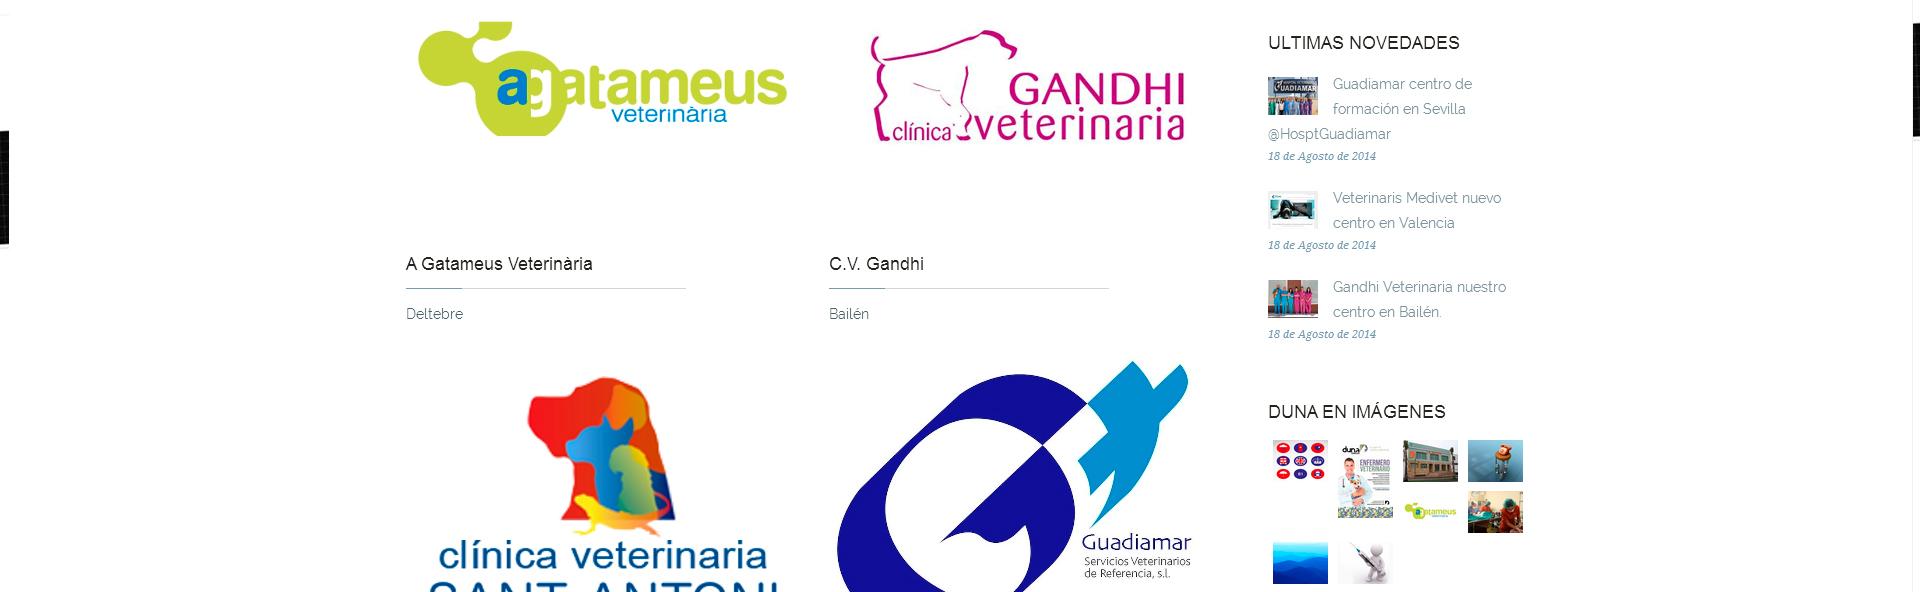 Detalle de diseño - Diseño web Duna